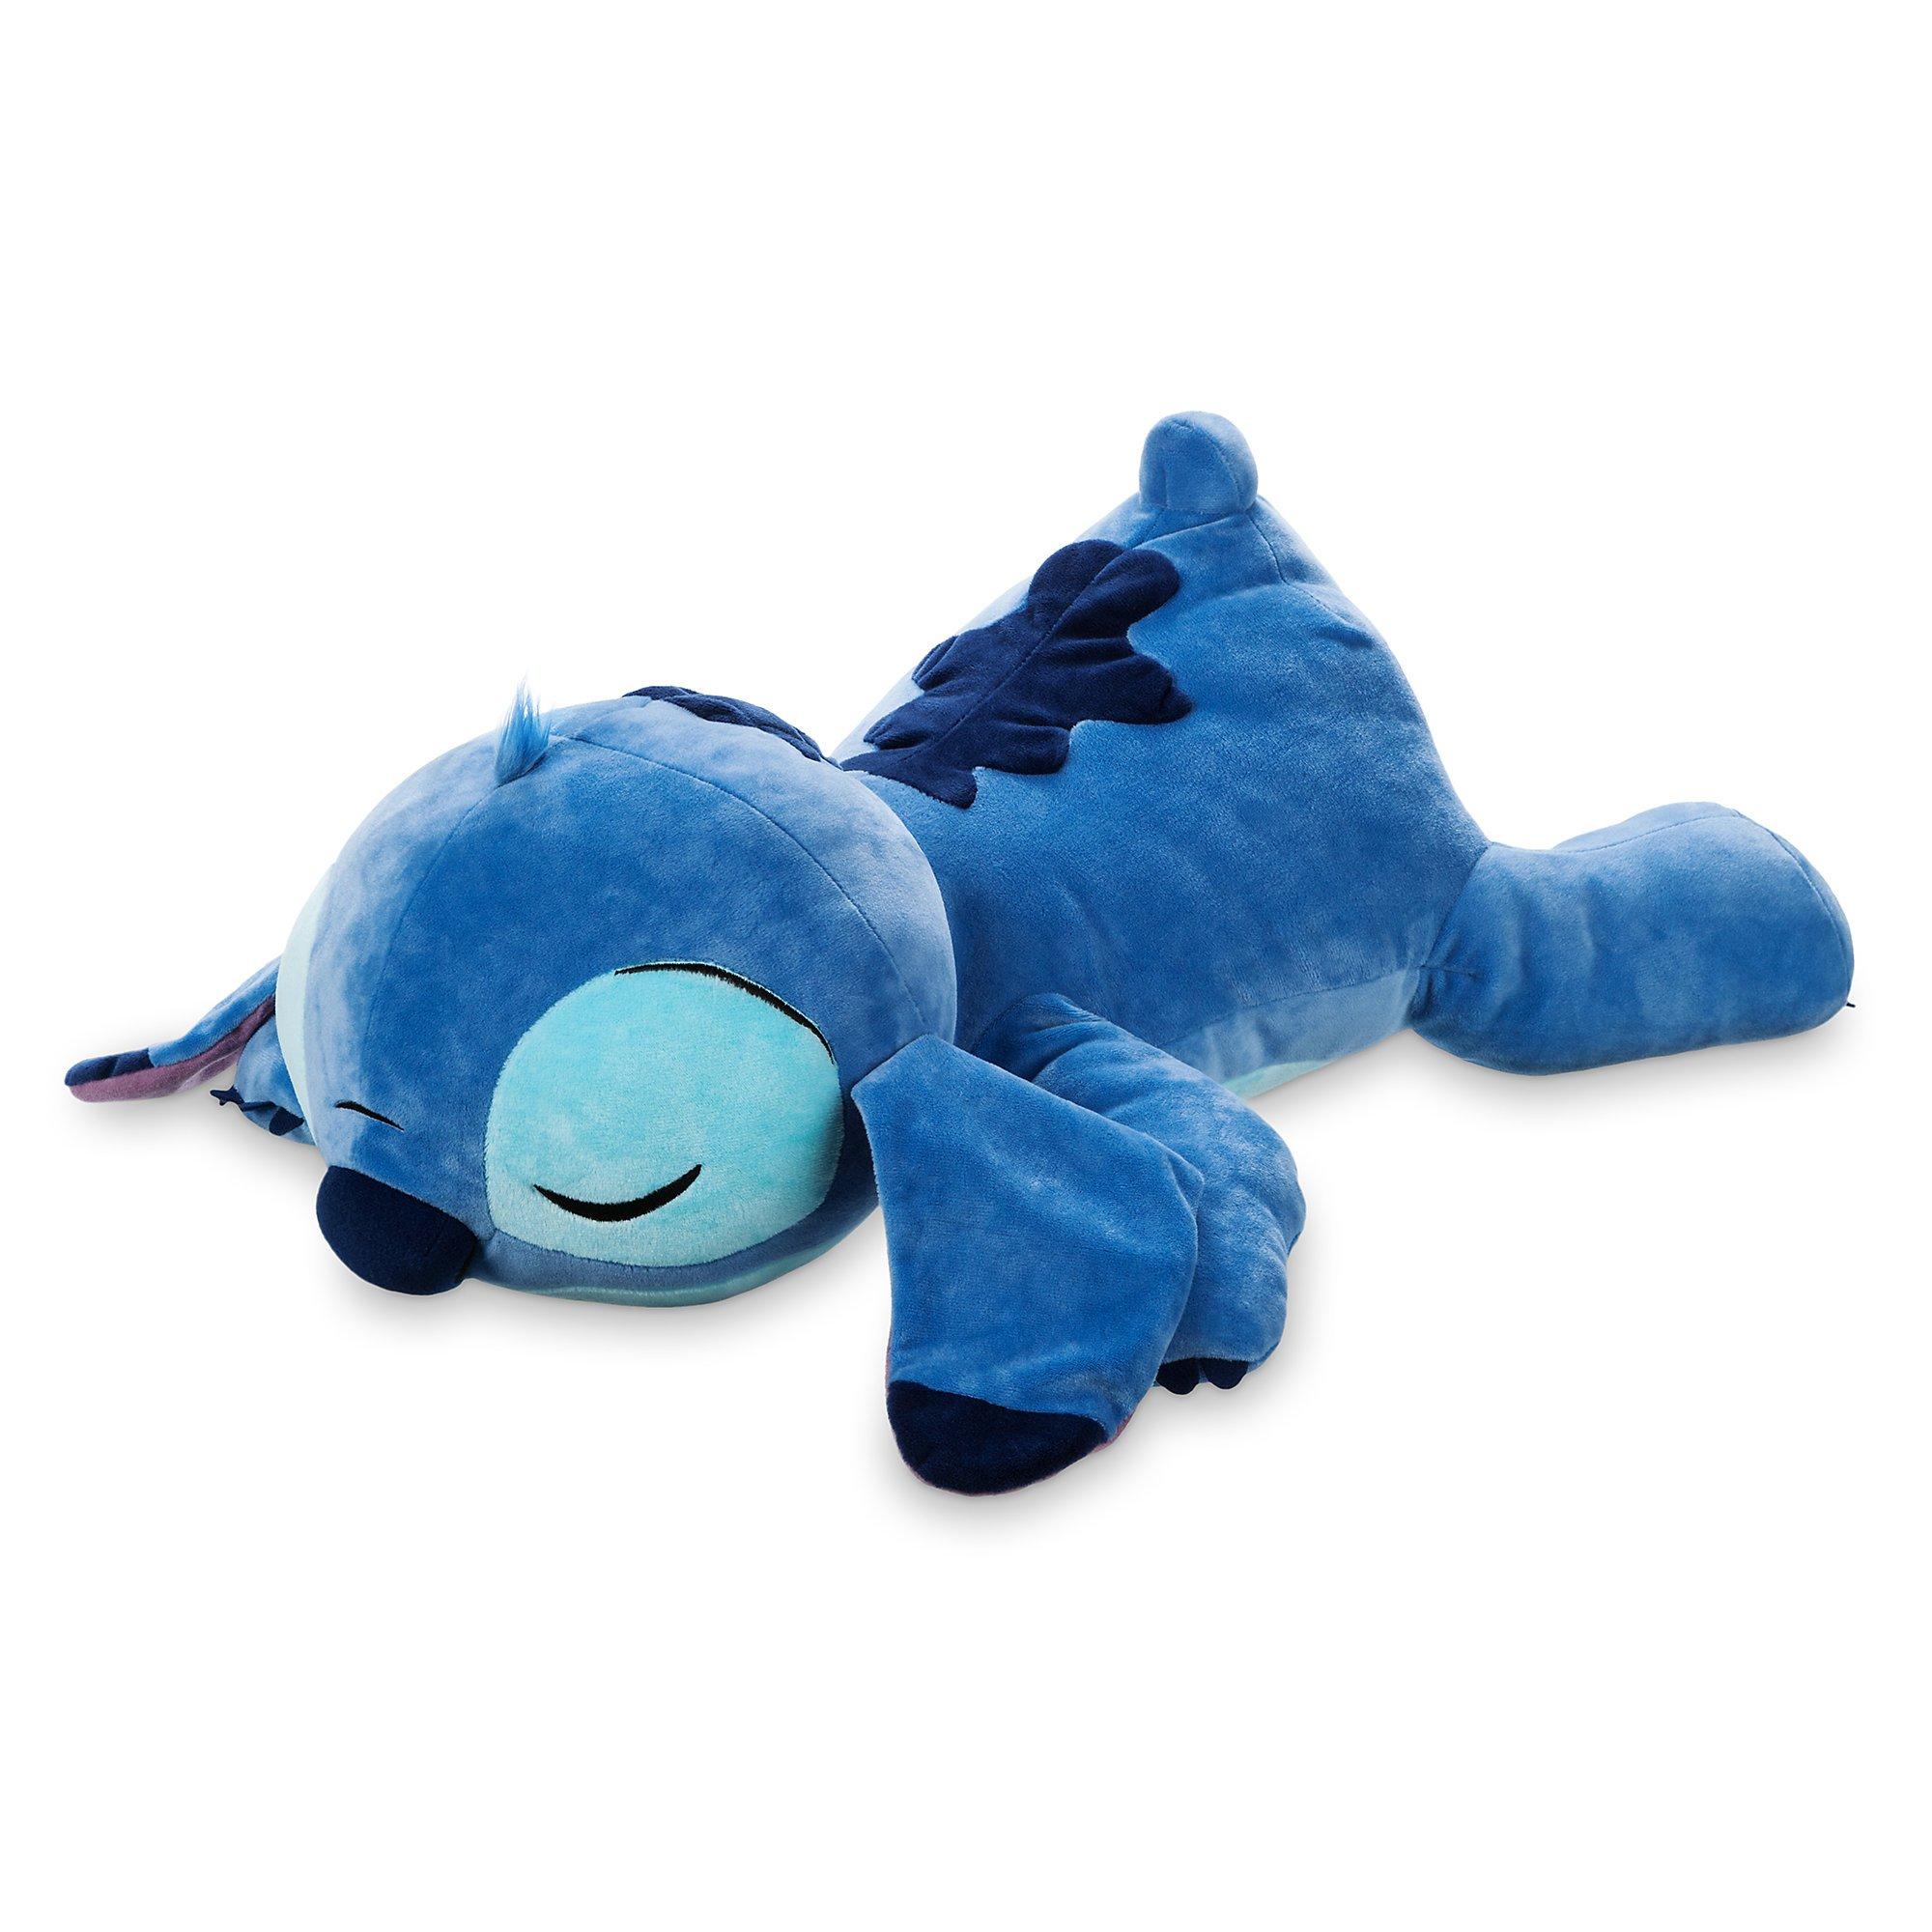 Disney Stitch Plush - Large by Disney